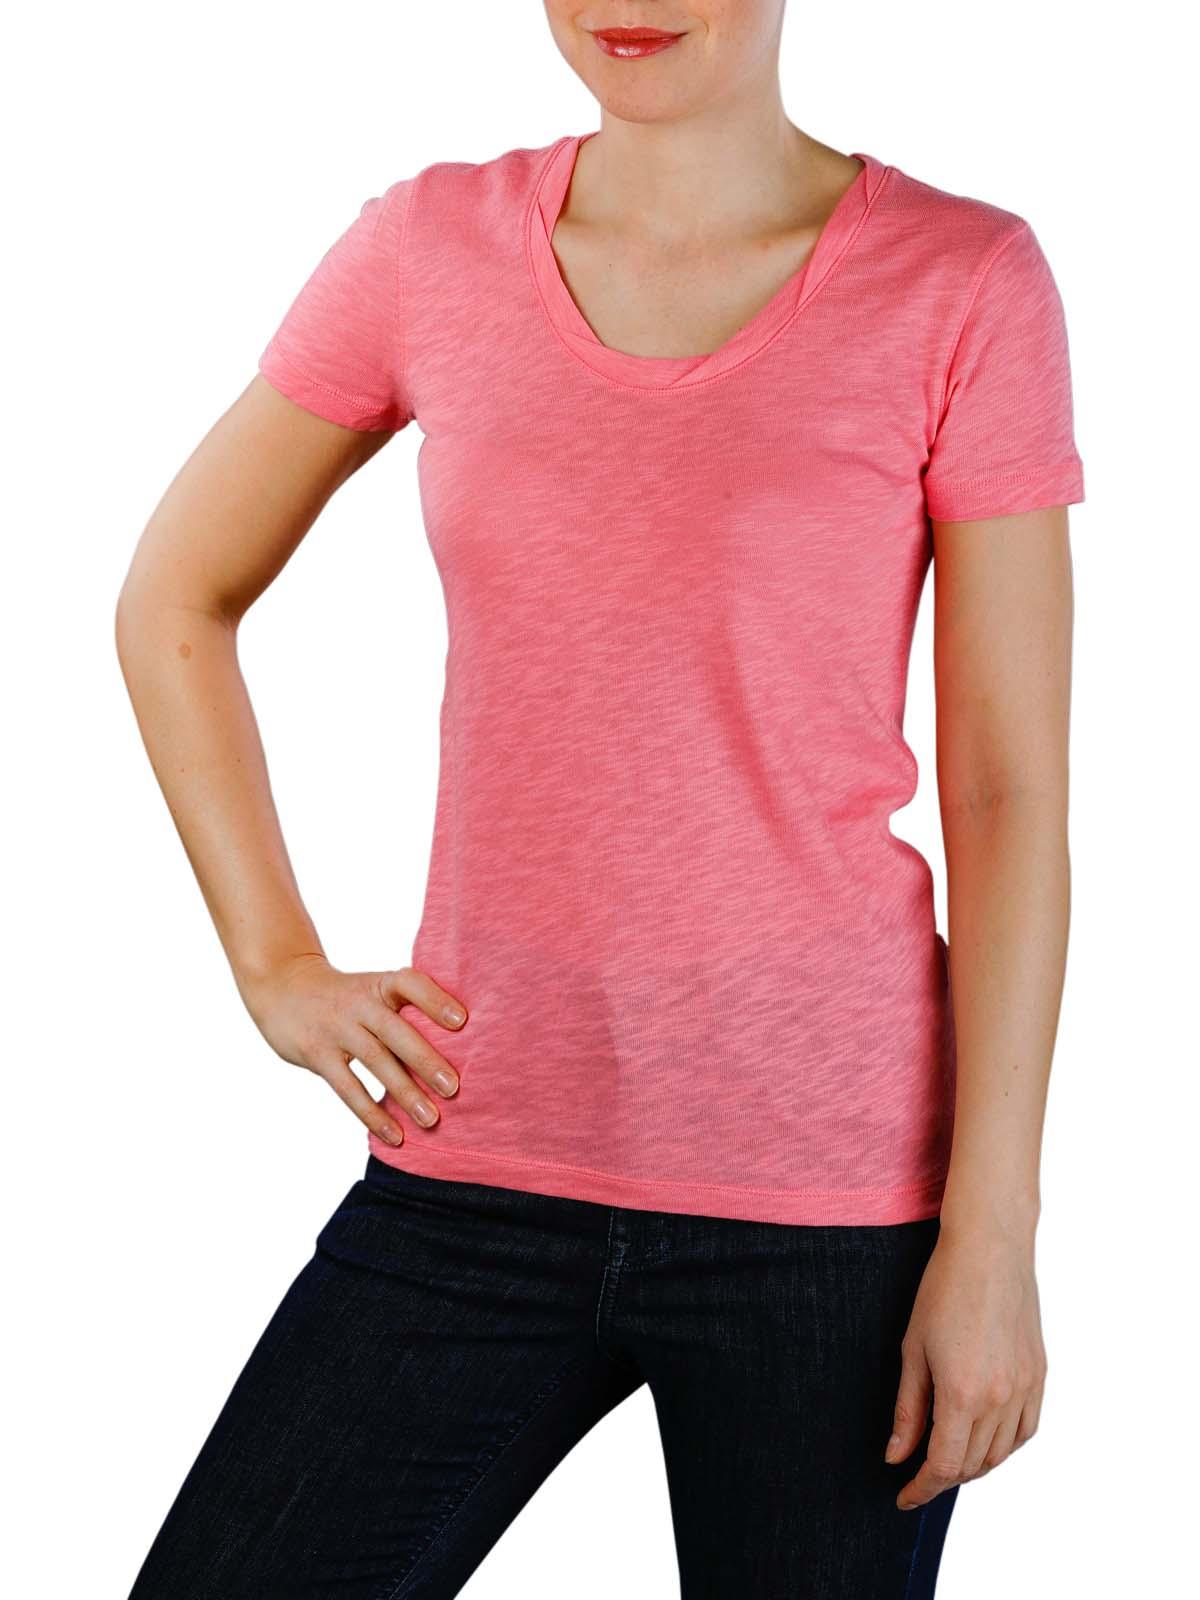 newest 9cbcb 25a96 Damen Bluse Marc O'Polo Women's Shirt | Free Shipping on ...